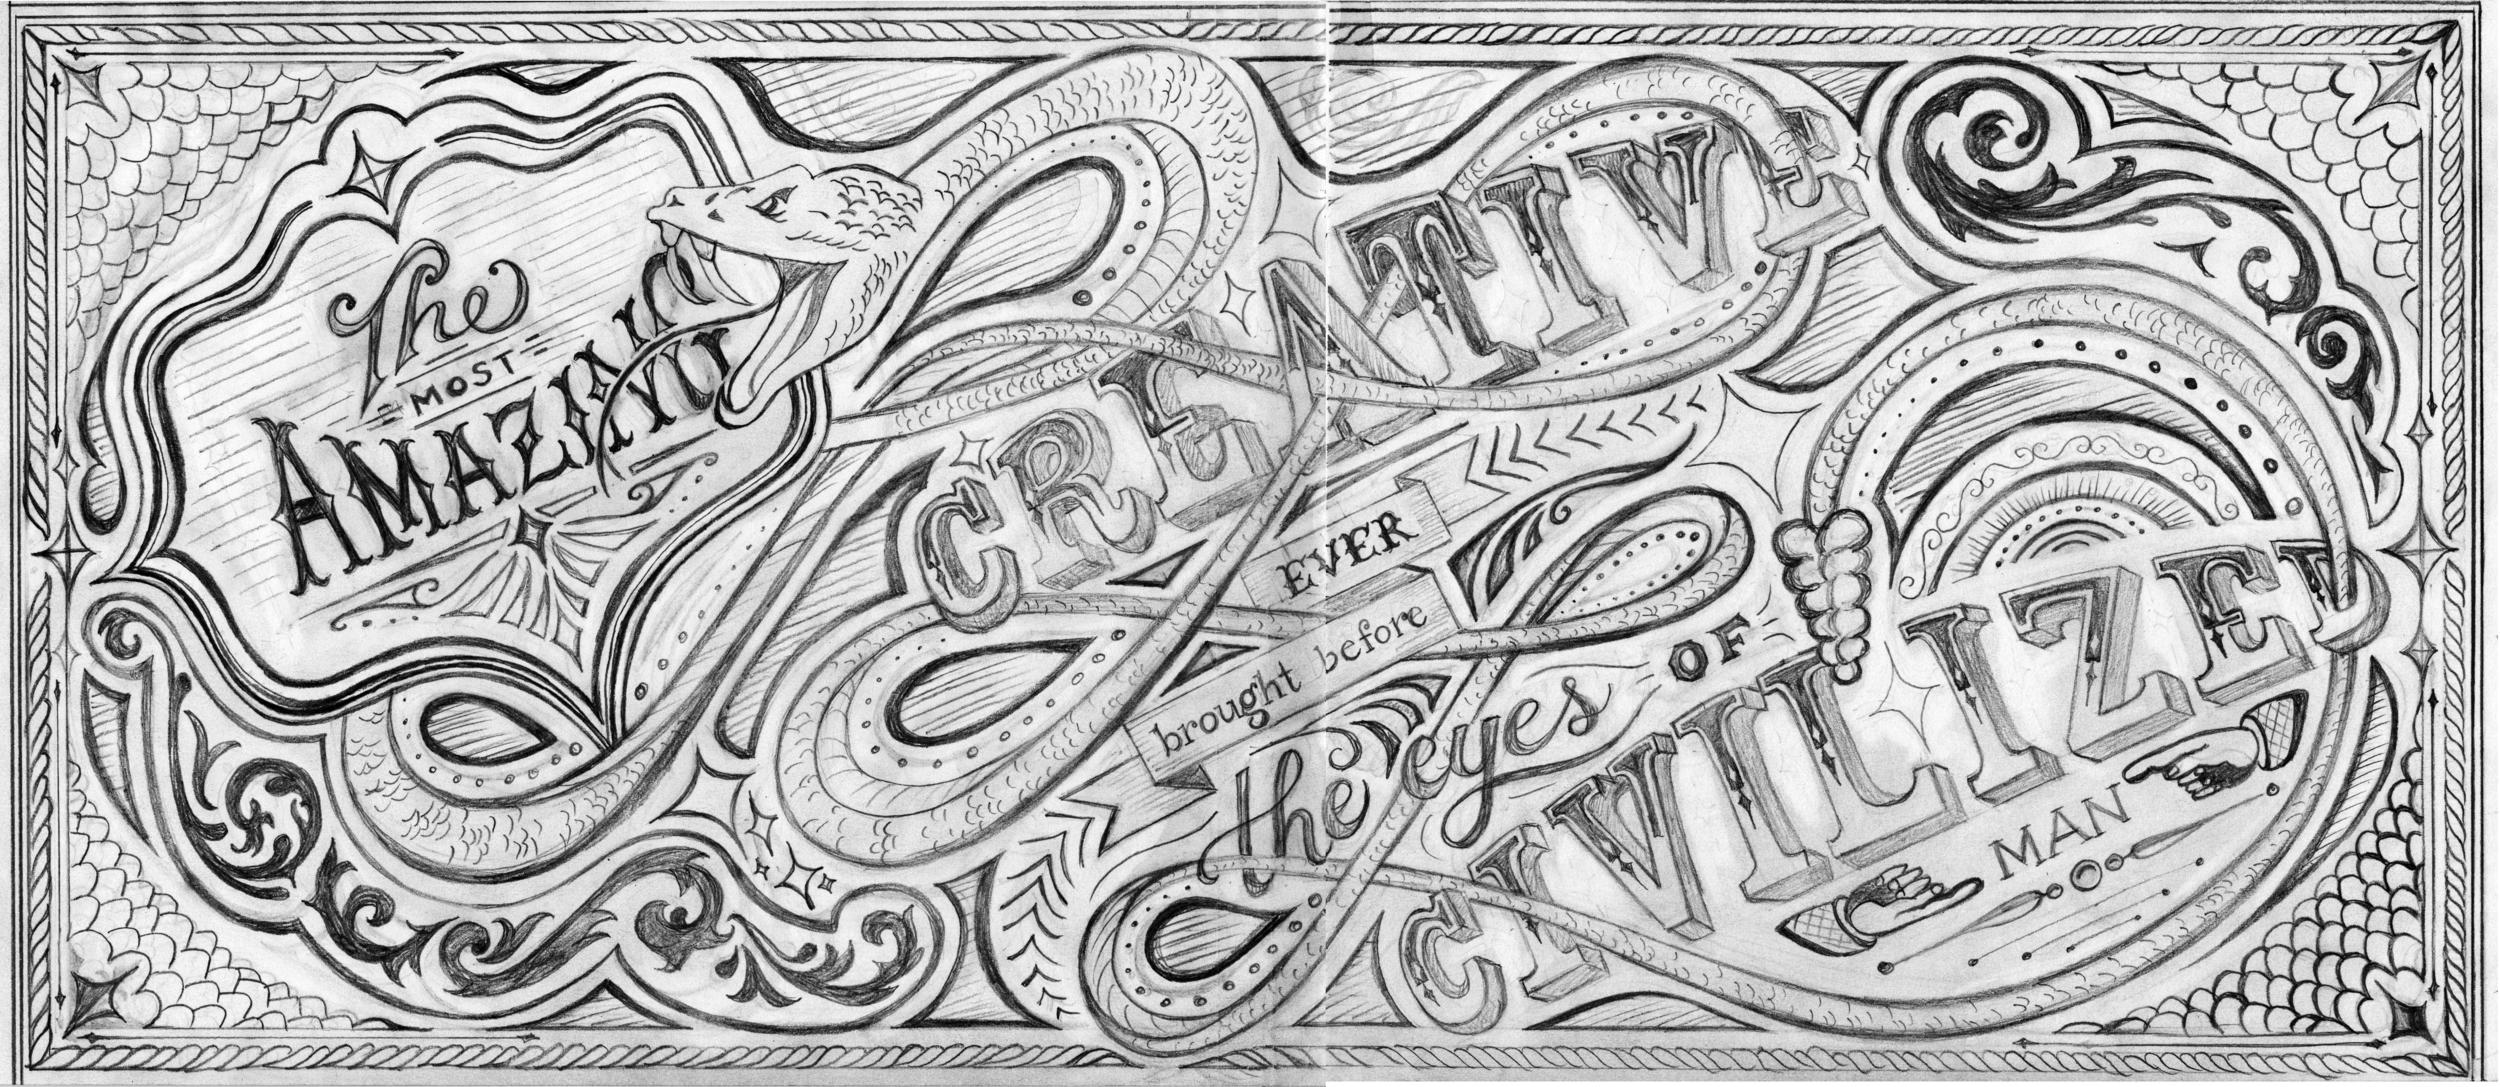 BEFORE:  Final hand drawing before the digital process began.